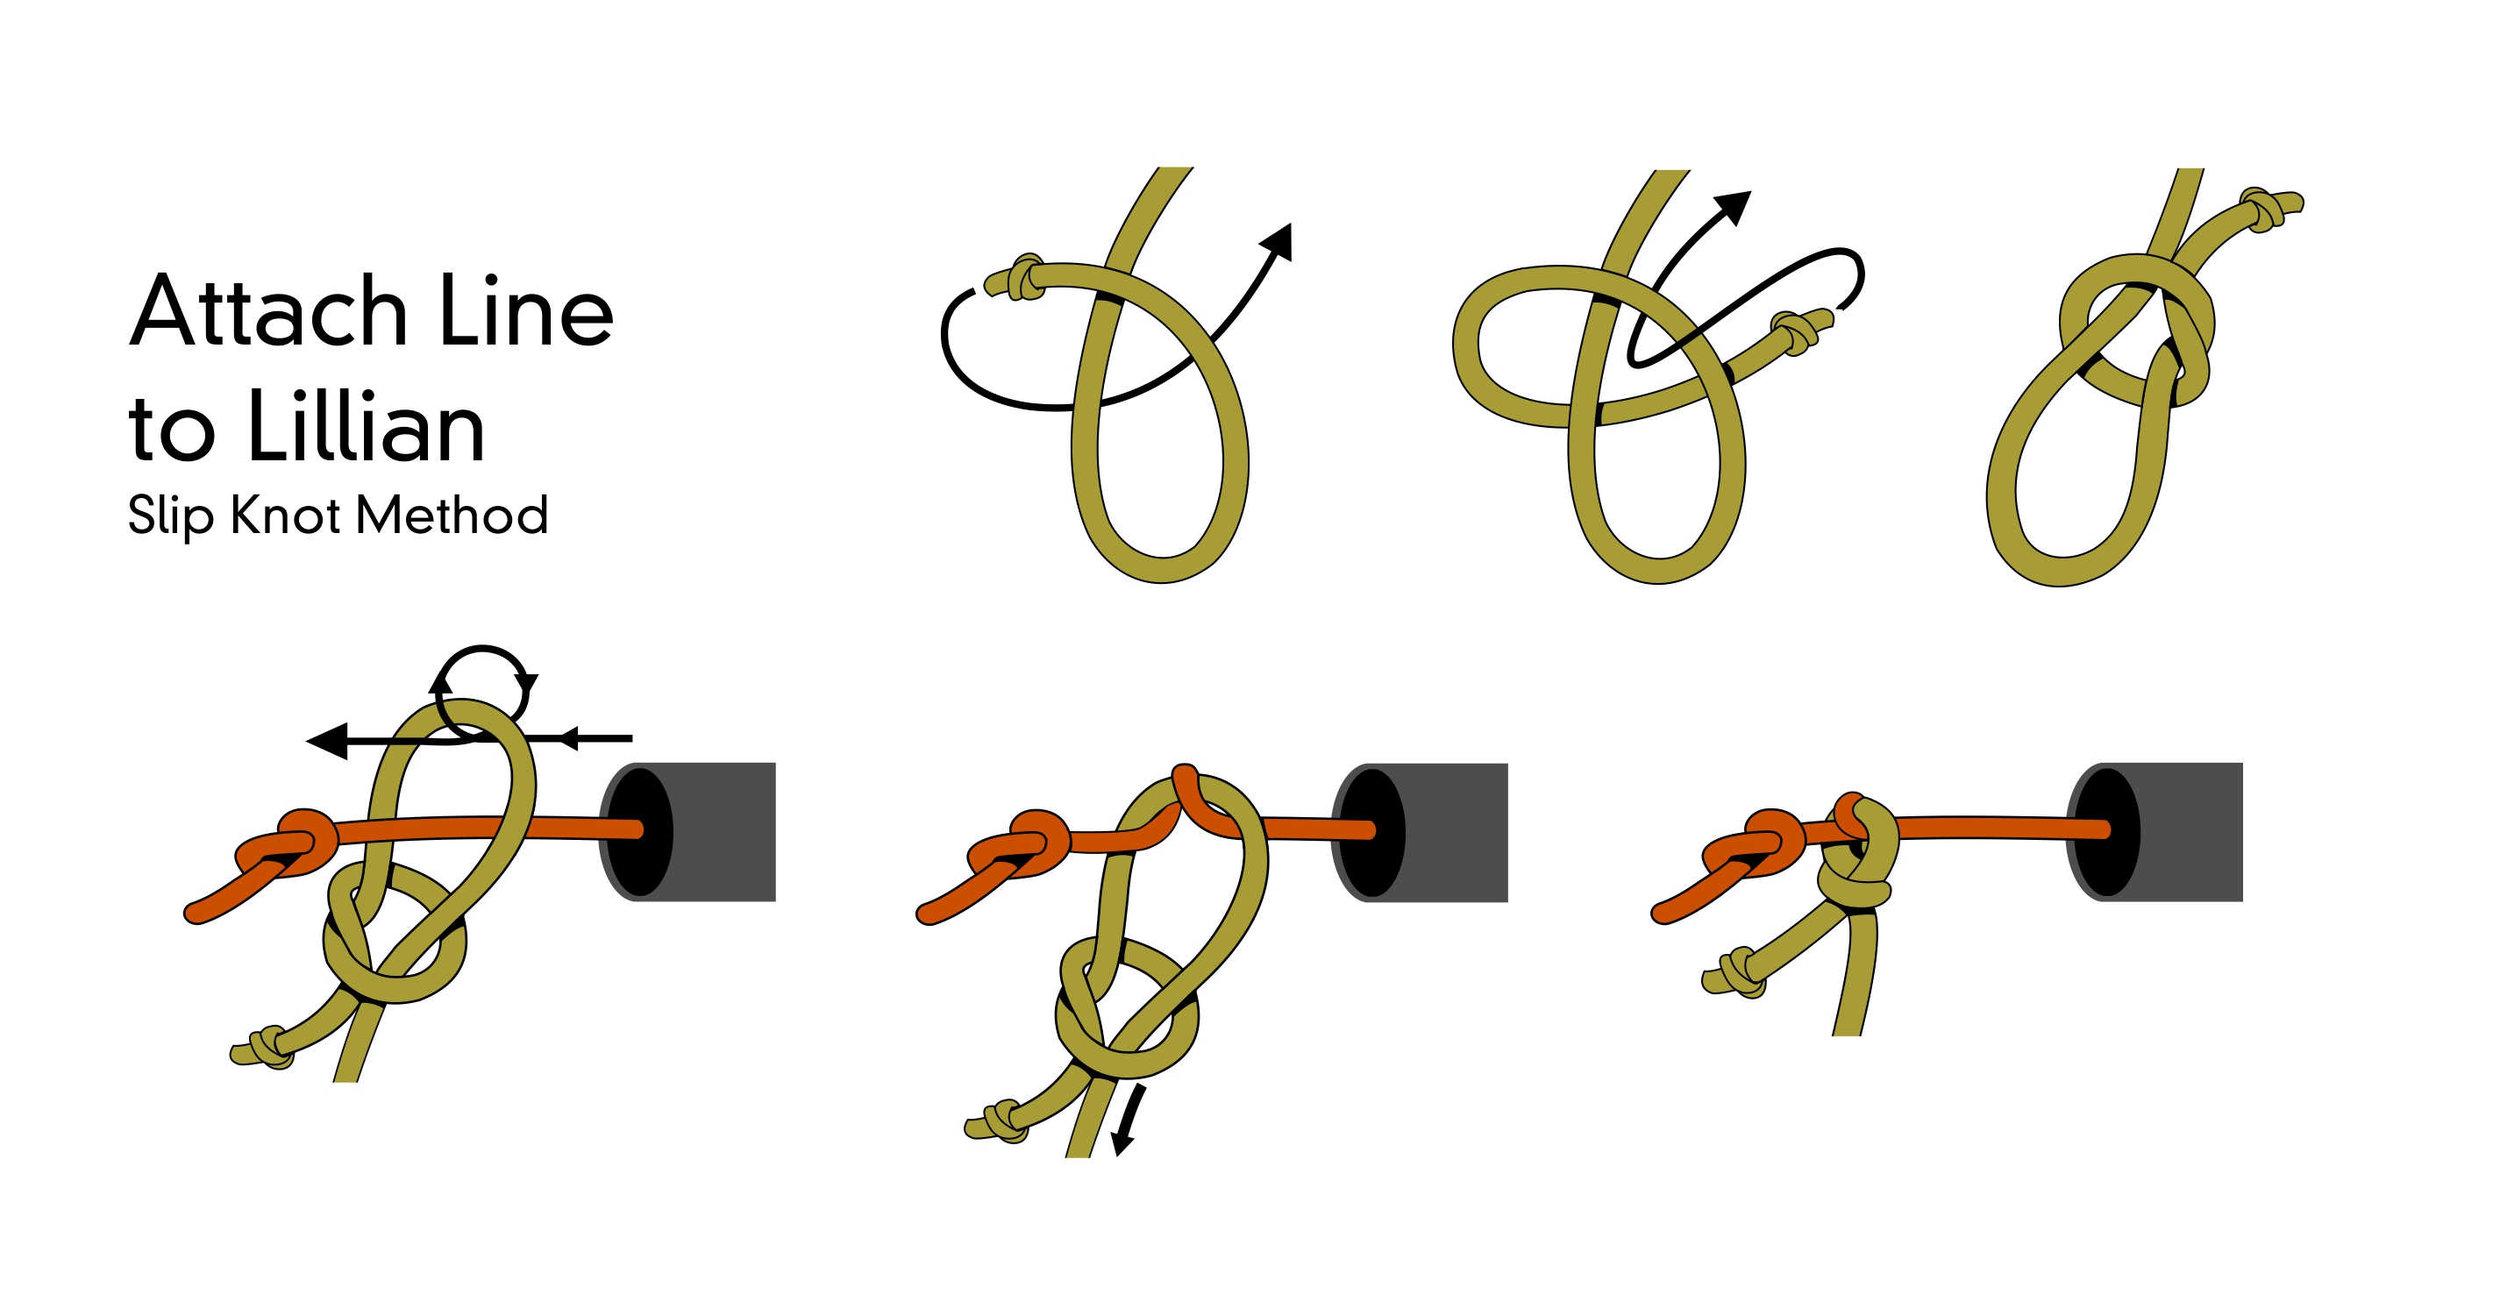 Keiryu Rod Co. Line to Lillian Using Slip Knot Illustration